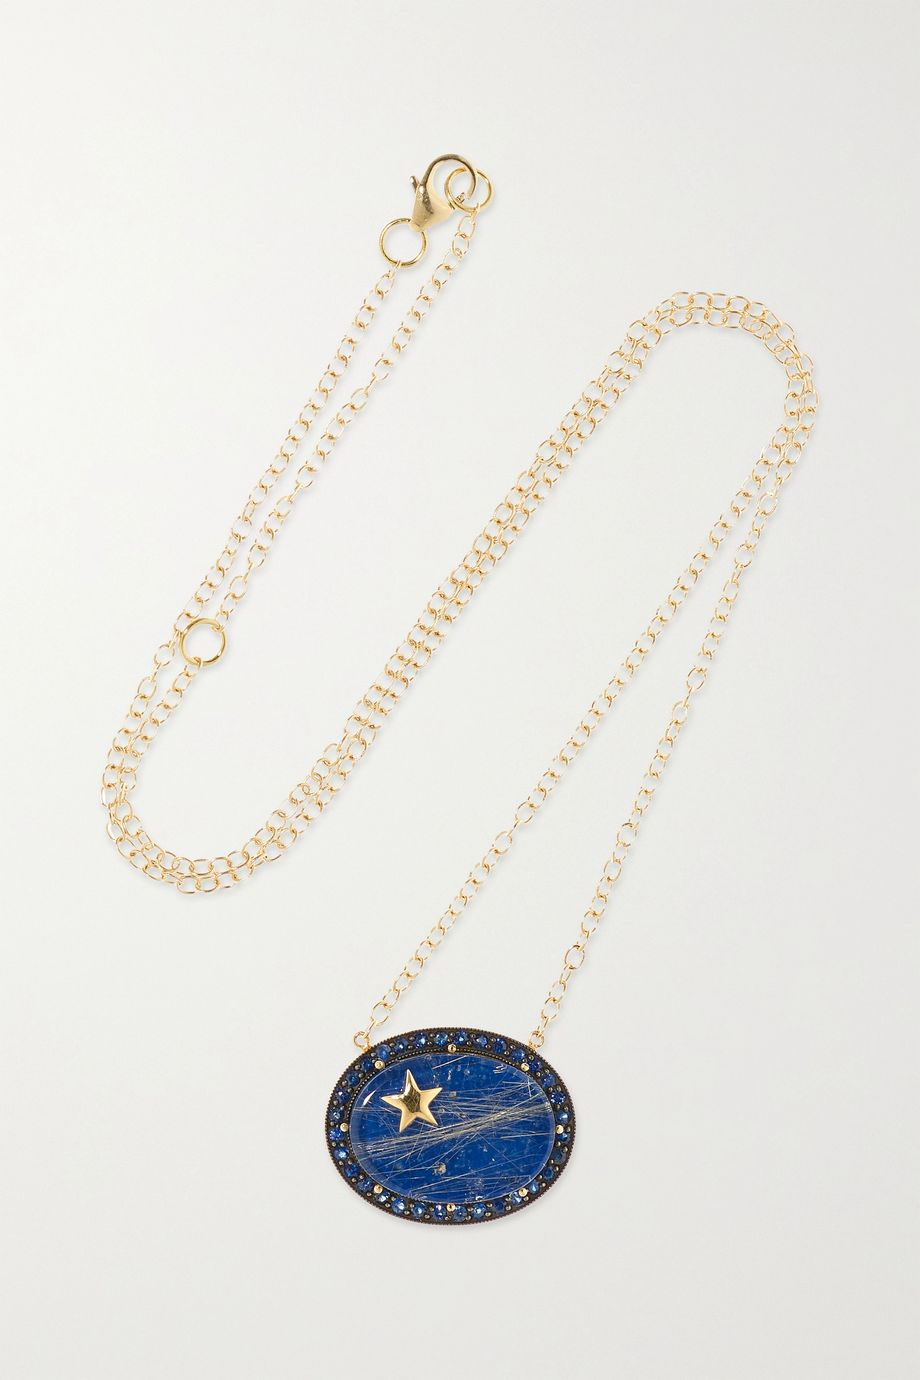 Andrea Fohrman Zenith 14-karat gold multi-stone necklace